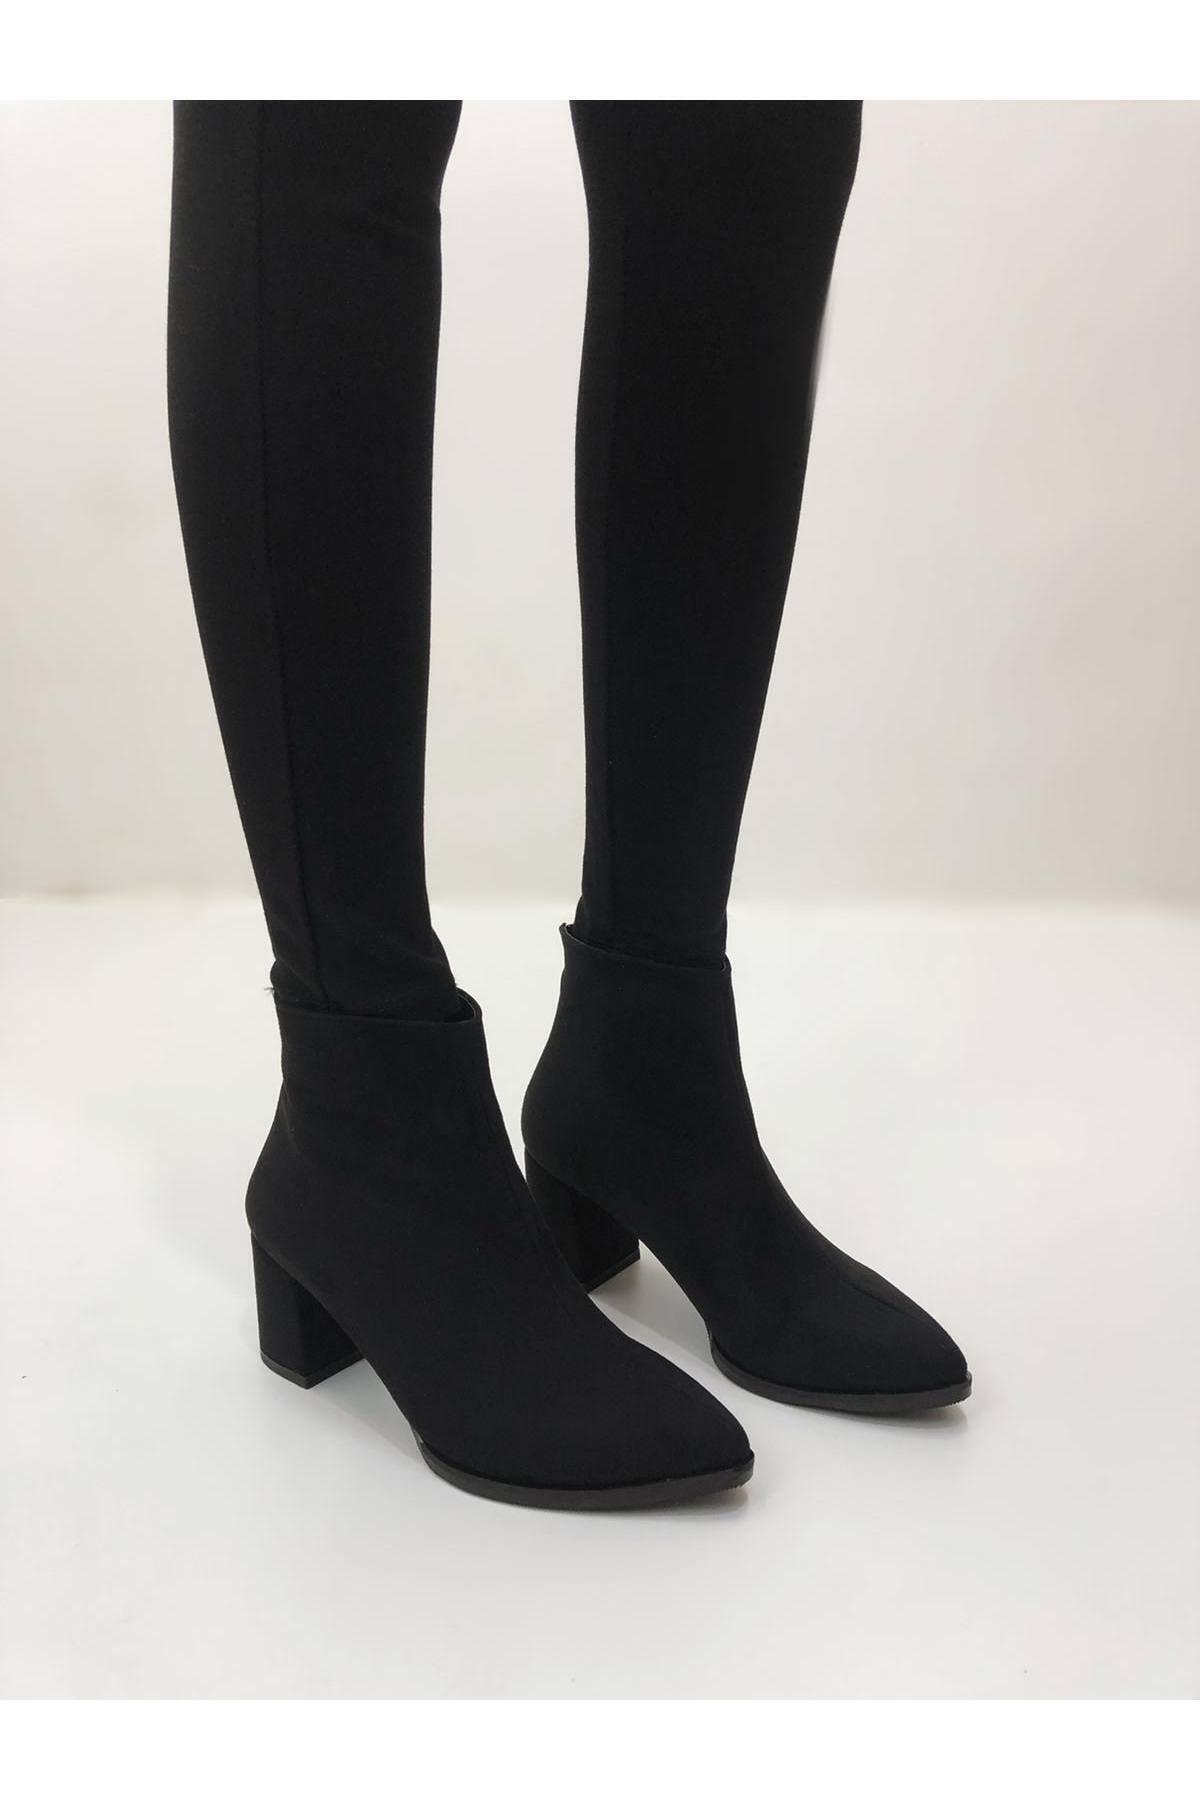 BasmakShoes Kadın Siyah Süet Topuklu Bot 2